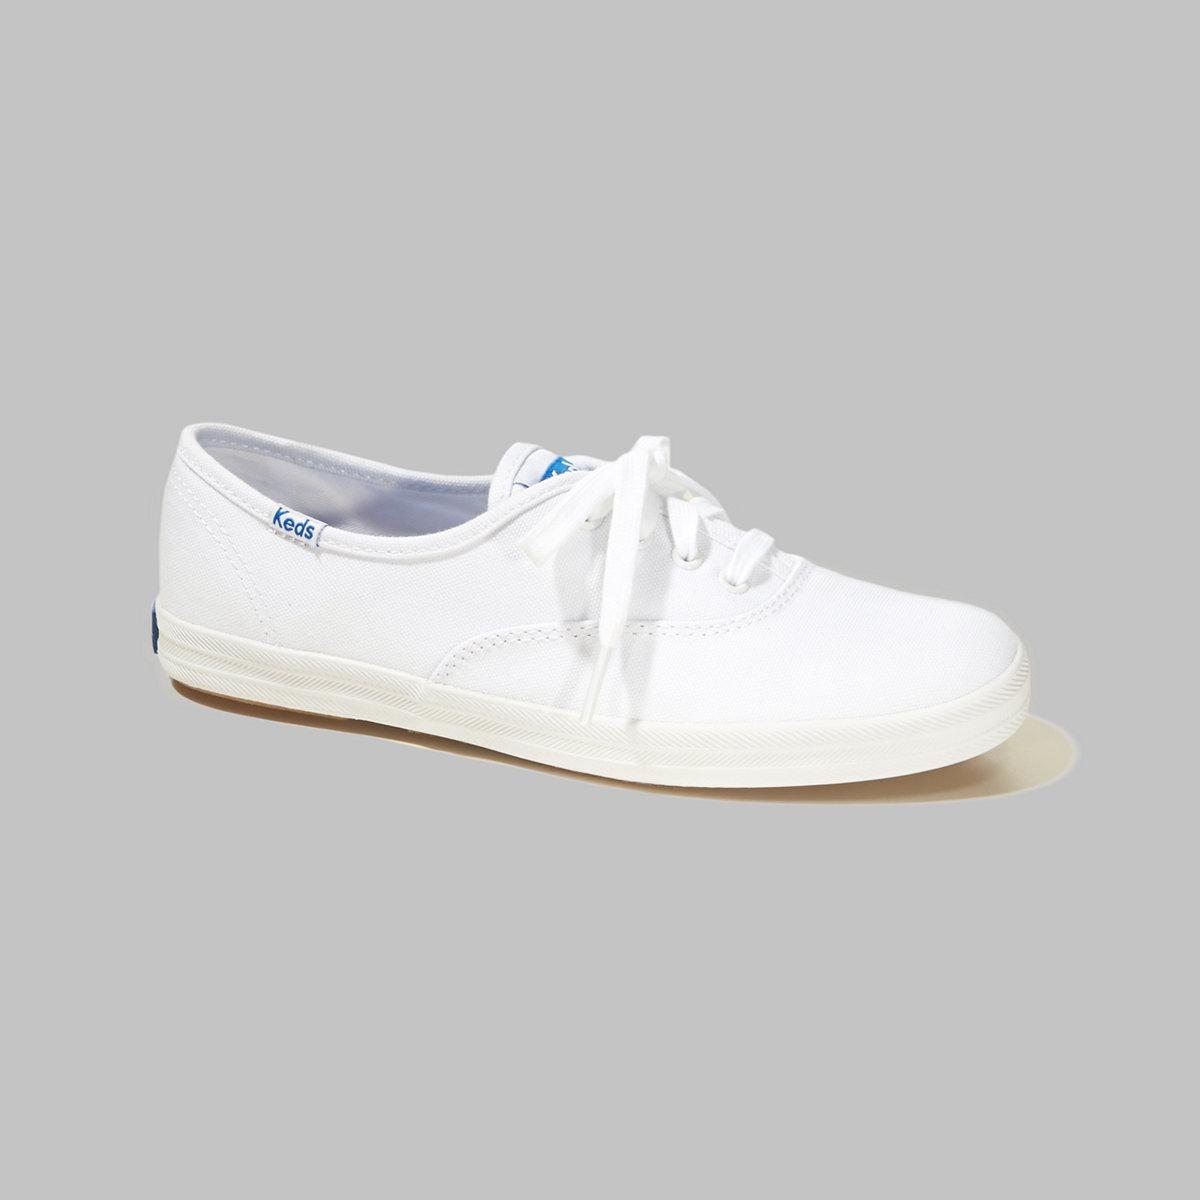 Keds Champion Original Sneaker